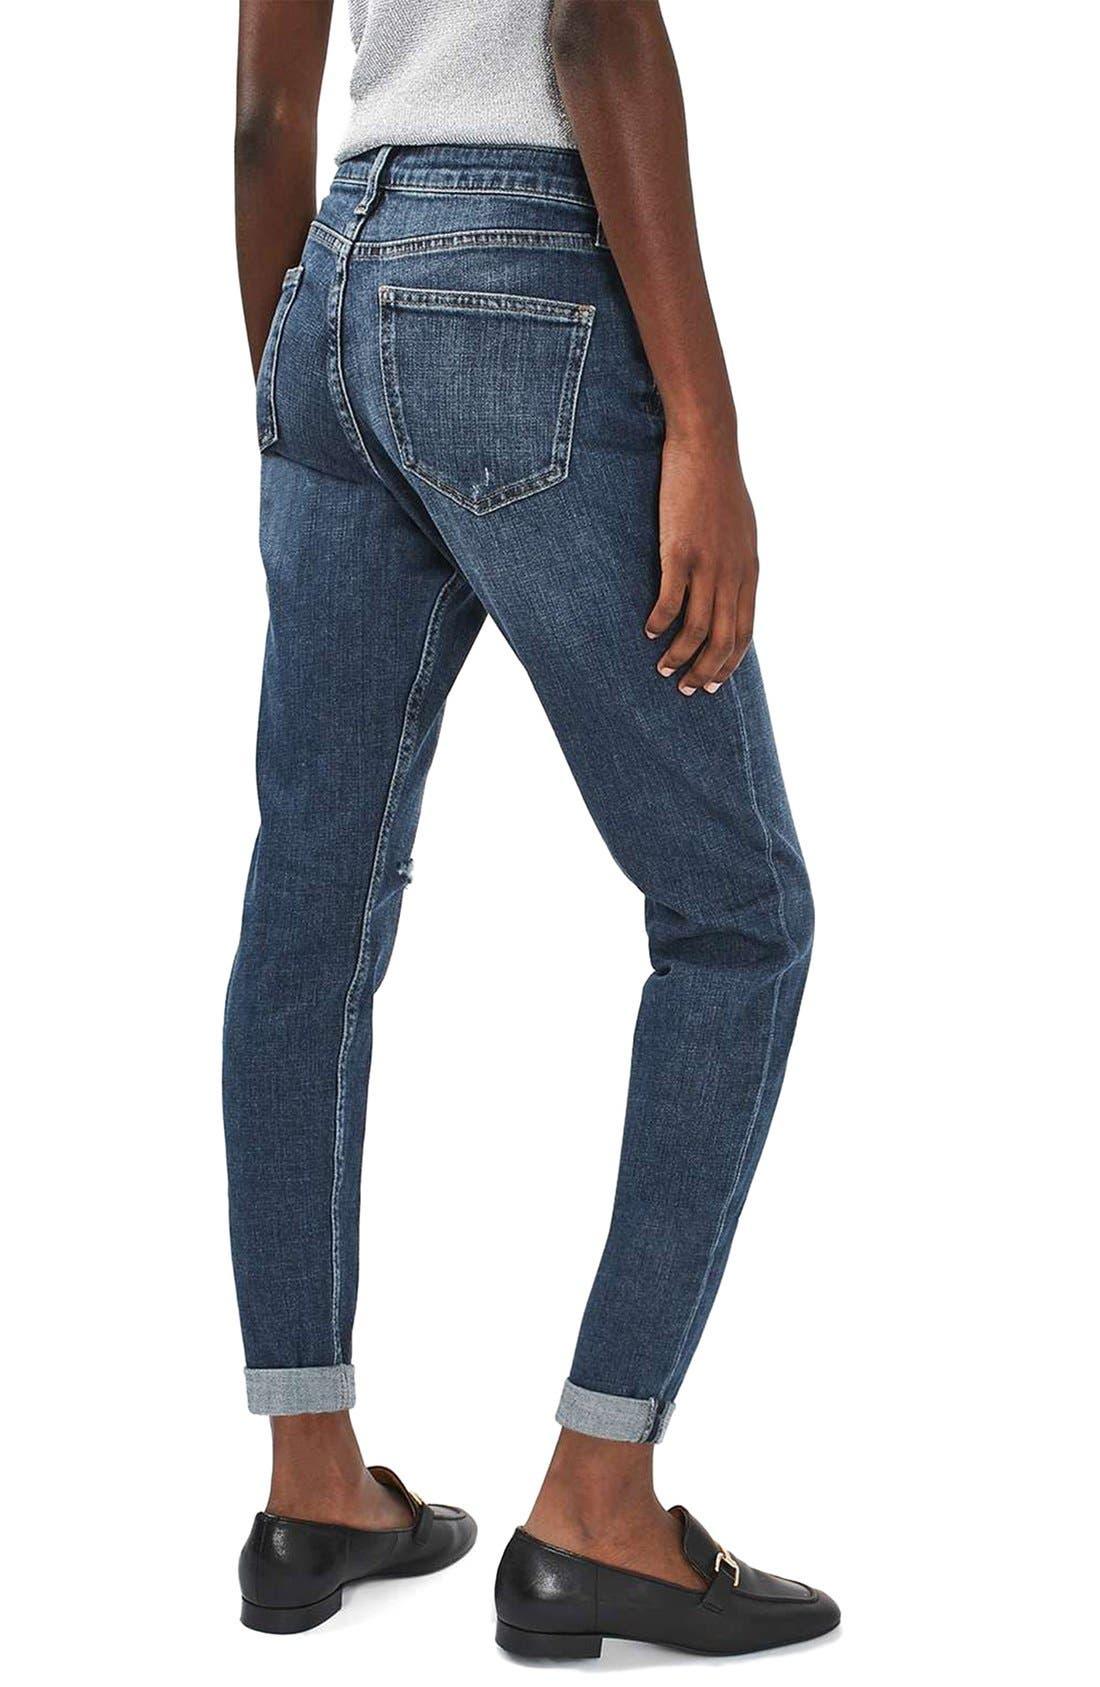 Alternate Image 3  - Topshop Lucas Ripped Boyfriend Jeans (Petite)